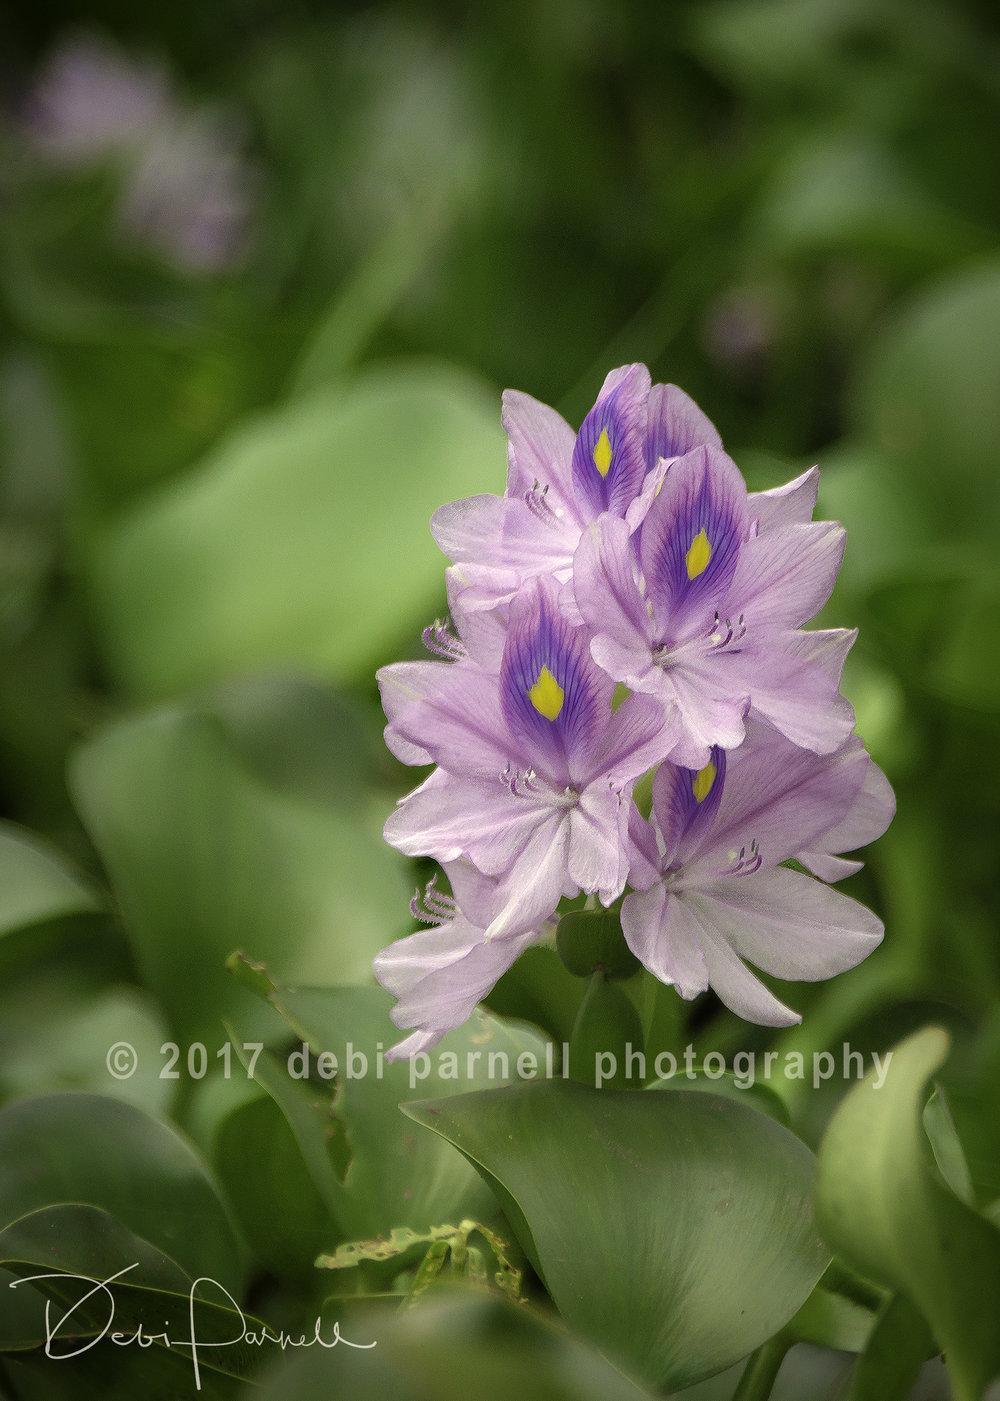 Copy of Water Hyacinth FL-003